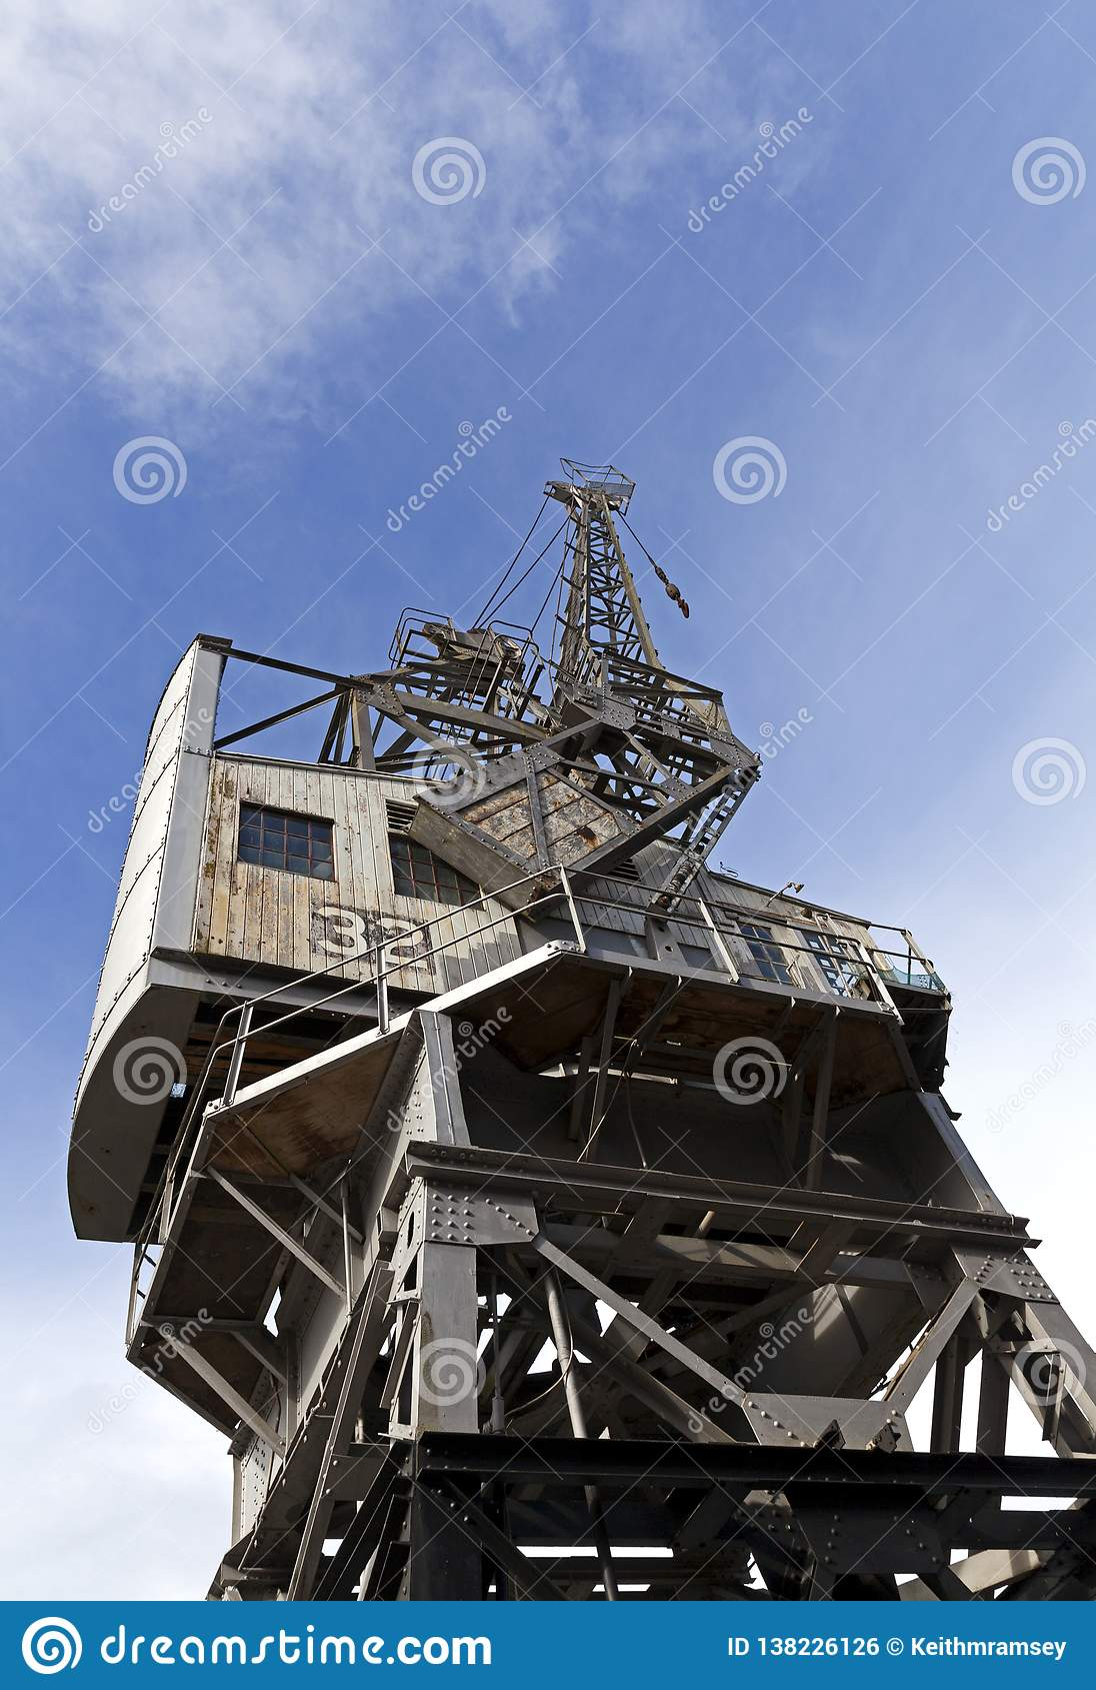 Stothert und Pitt 10 Ton Dockside Crane